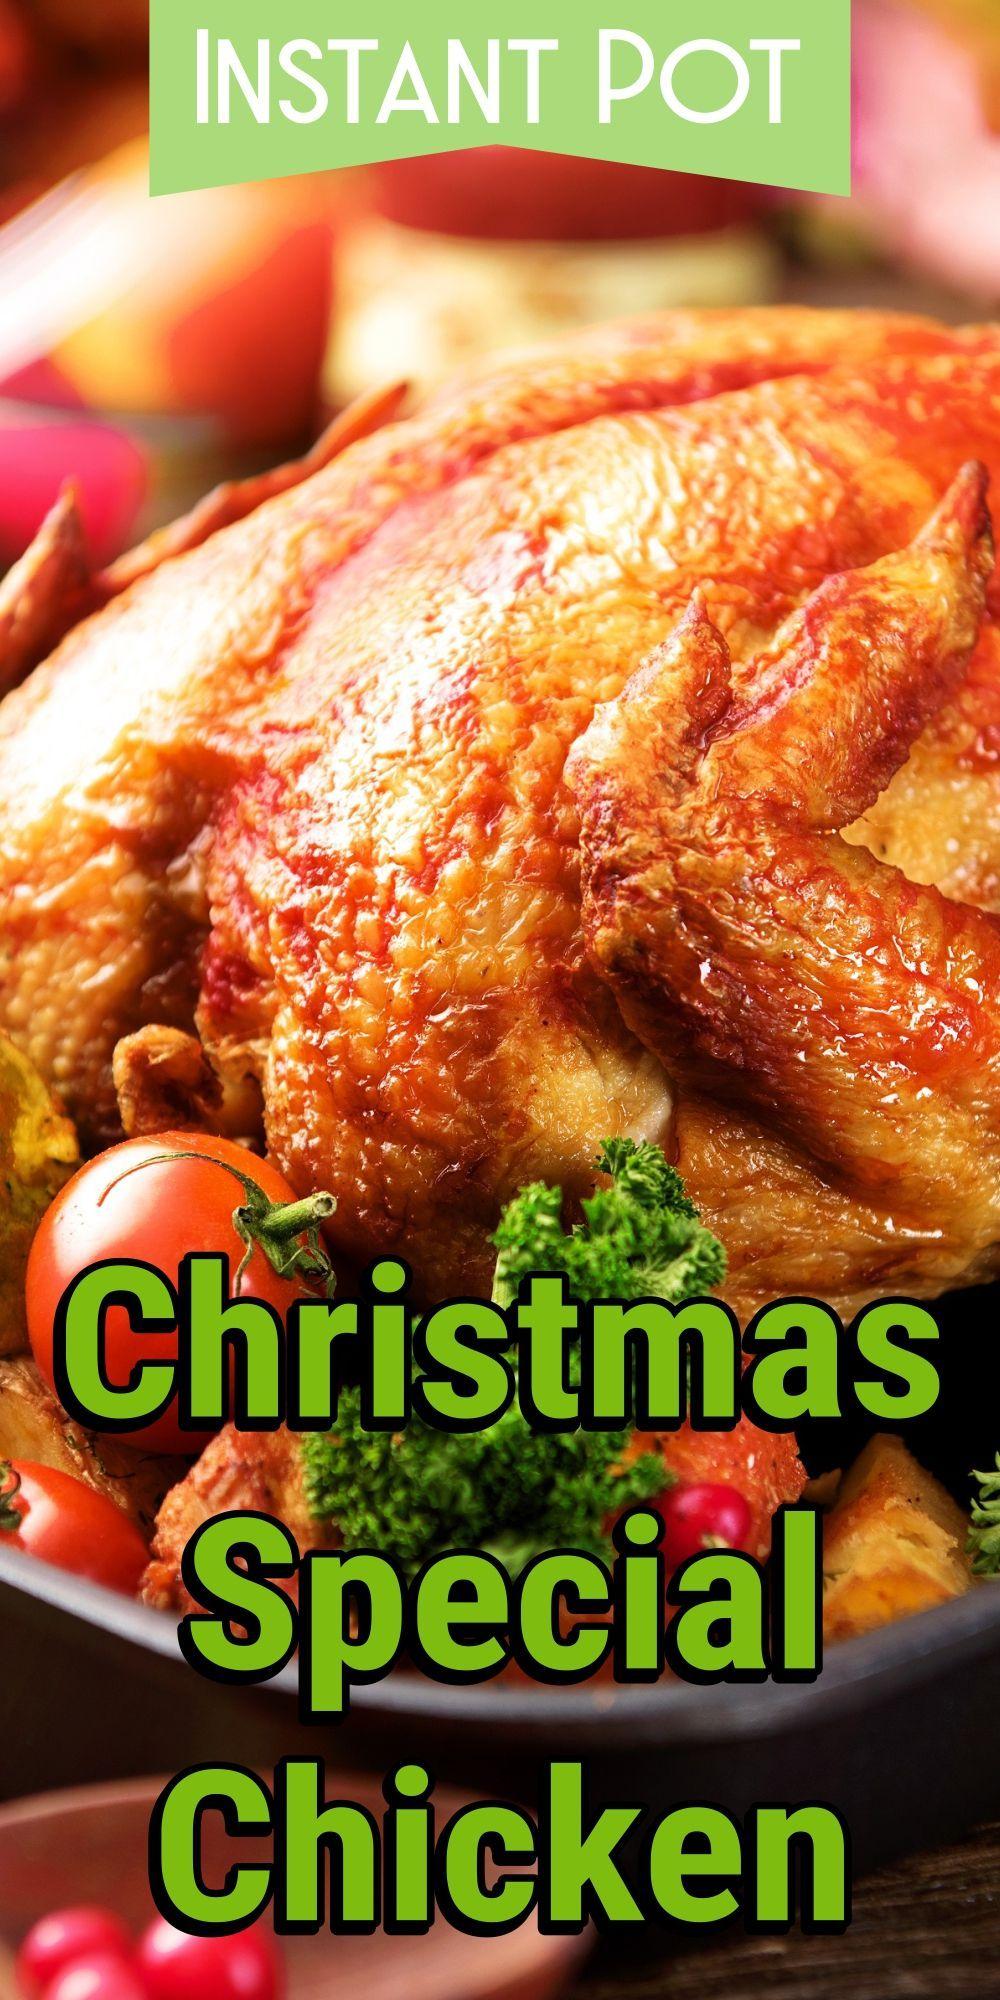 Instant Pot Christmas Special Chicken Recipe Instant Pot Recipes Instant Pot Soup Recipes Best Chicken Recipes